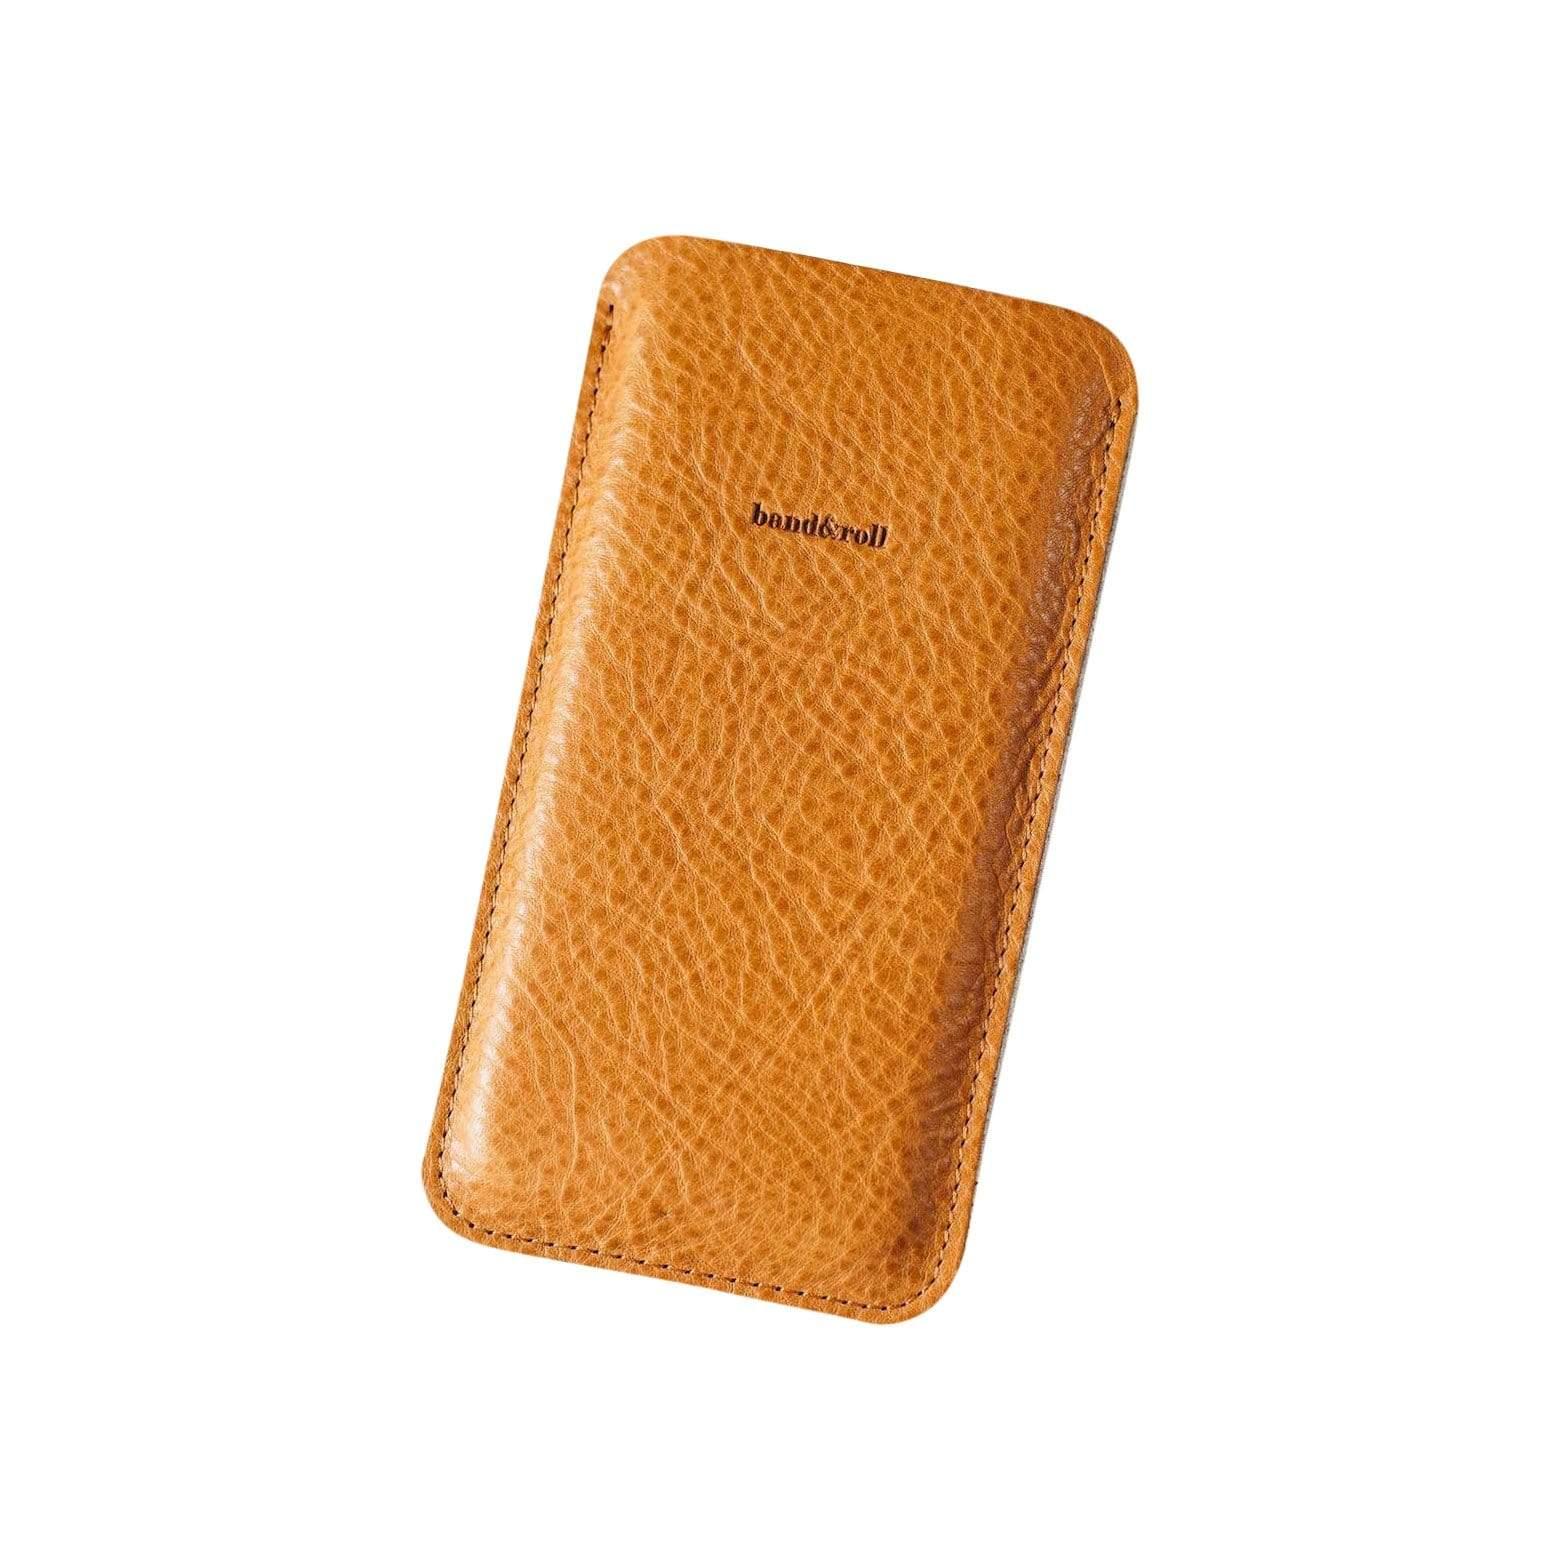 BAND & ROLL Dandy Leather + Felt Phone Case